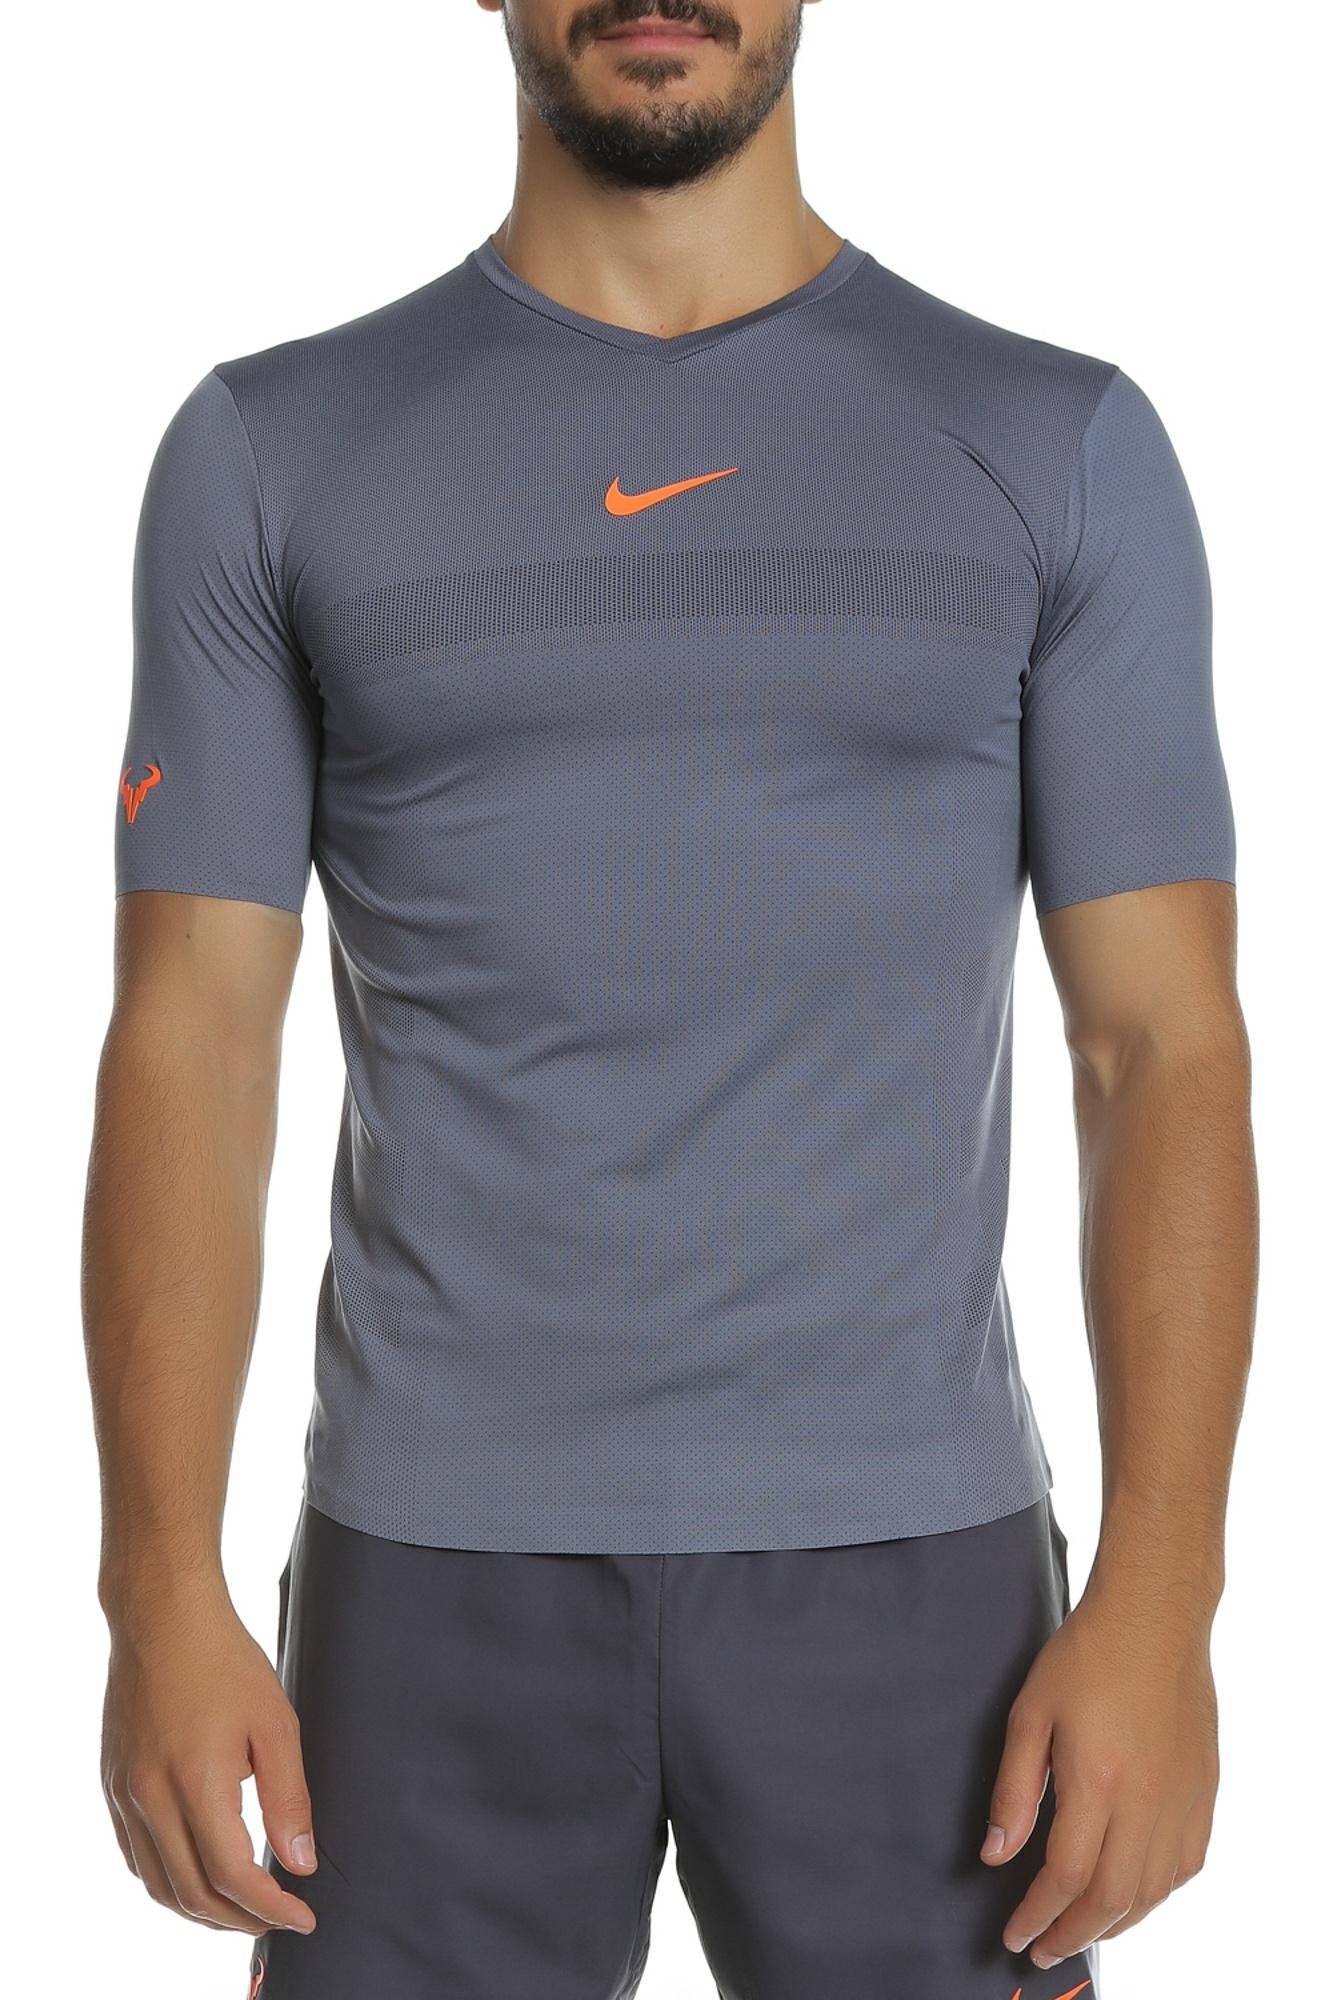 8017dd94b1cb NIKE - Ανδρική κοντομάνικη μπλούζα Nike Court AeroReact Rafa ανθρακί